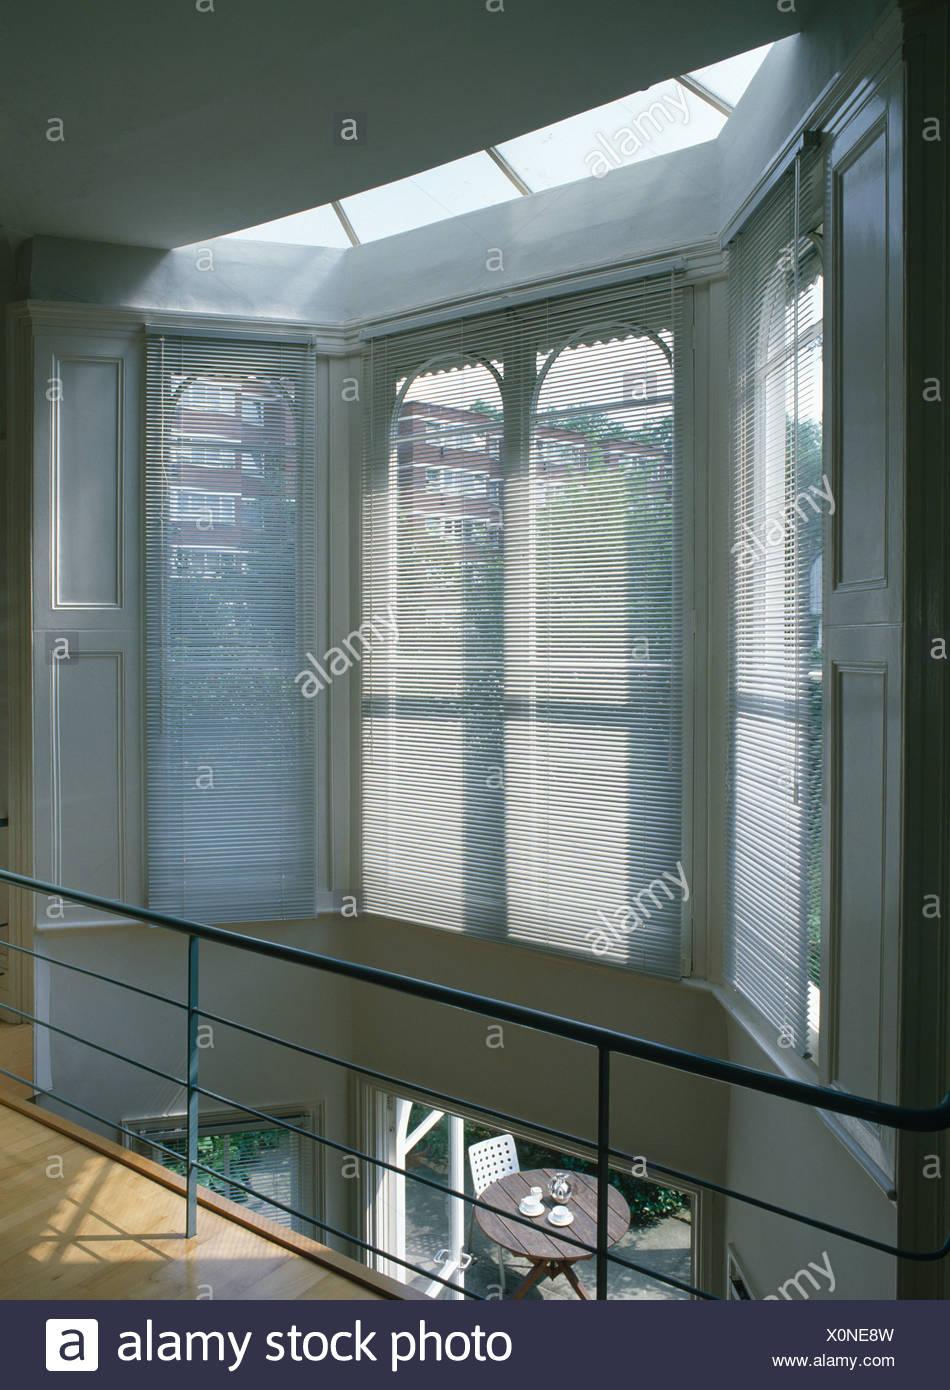 Mezzanine Interiors Stockfotos & Mezzanine Interiors Bilder - Alamy